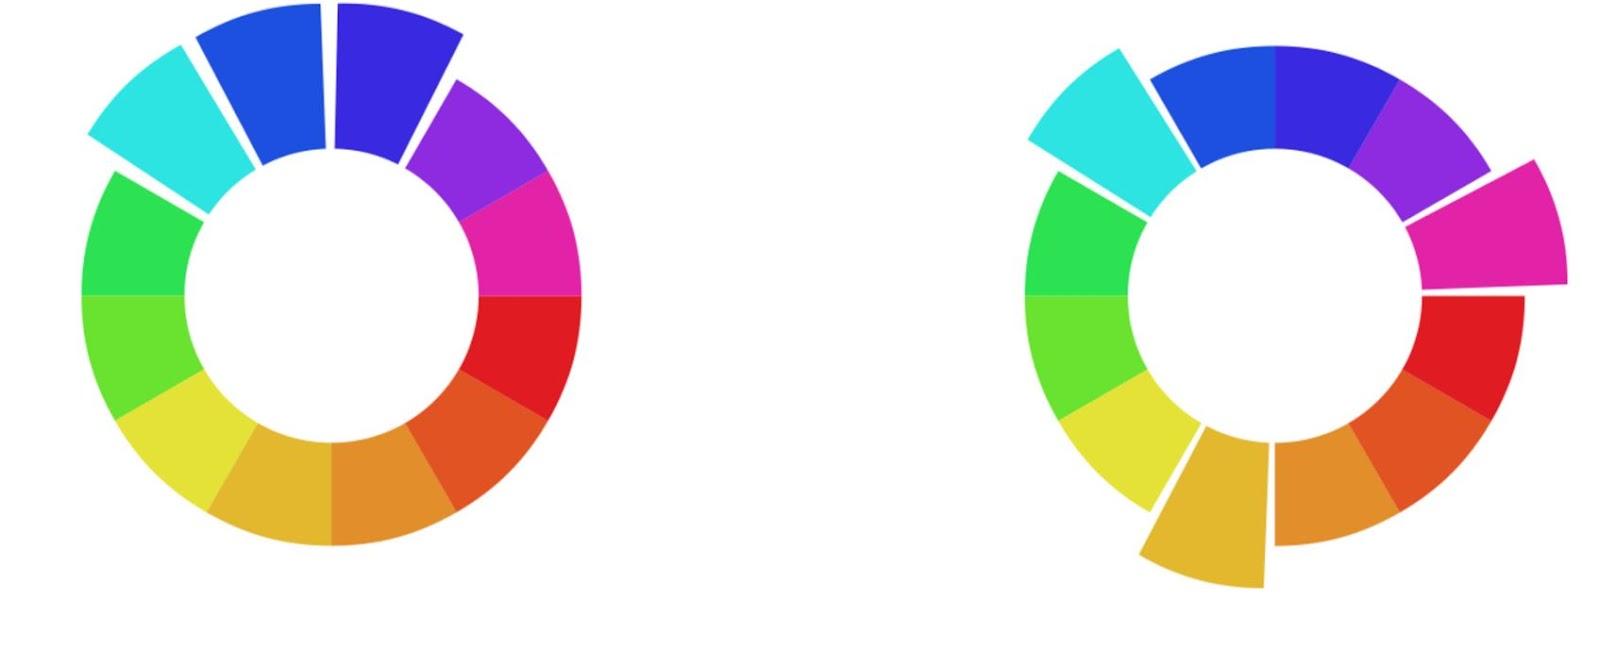 Guía completa: El significado de los colores en Marketing - rI7pJSpqbDcrDuDp29tDbnVq QOj7 EHcgdaDM0j68tR gx2kmnEEQl8iLv7UF2C9sSJLO3LxBhDvuYYGItcoRSgeupJTd87ru4OQ9KdXbW4Lora GKiXsu13laRZQtWpsFUmgtn